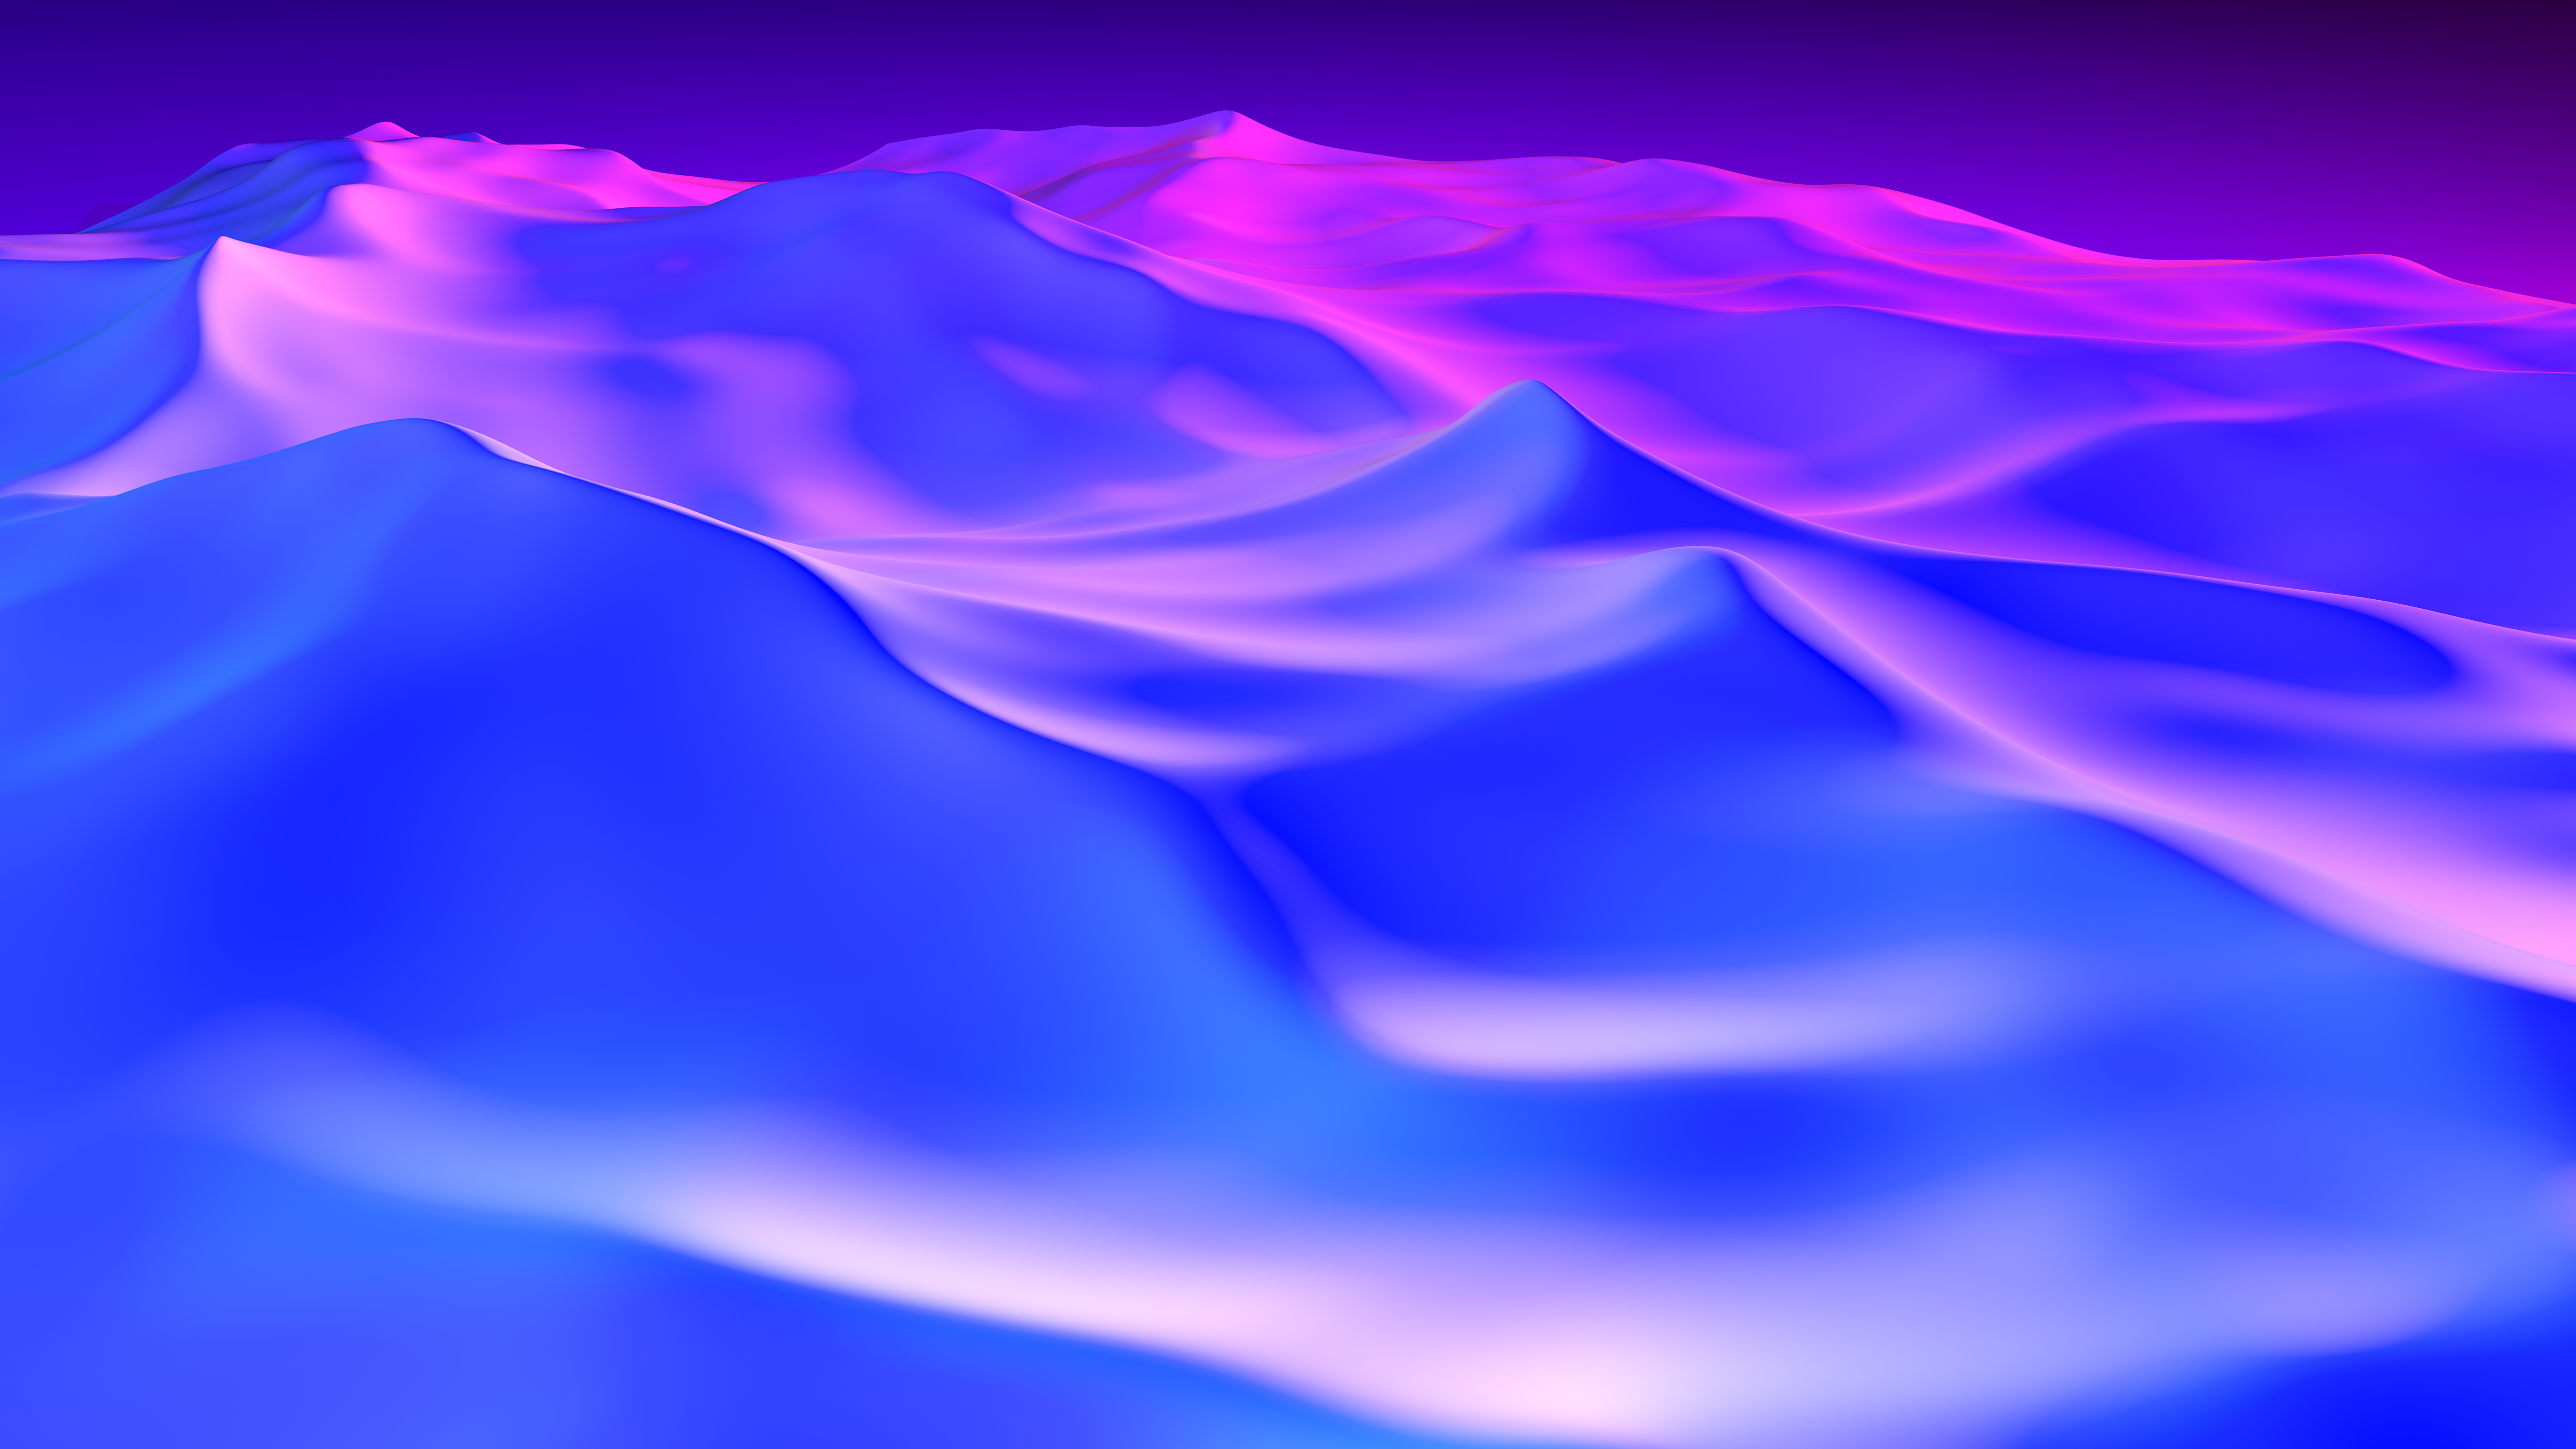 Download Wallpaper 5k Wallpaper For Macbook Pro